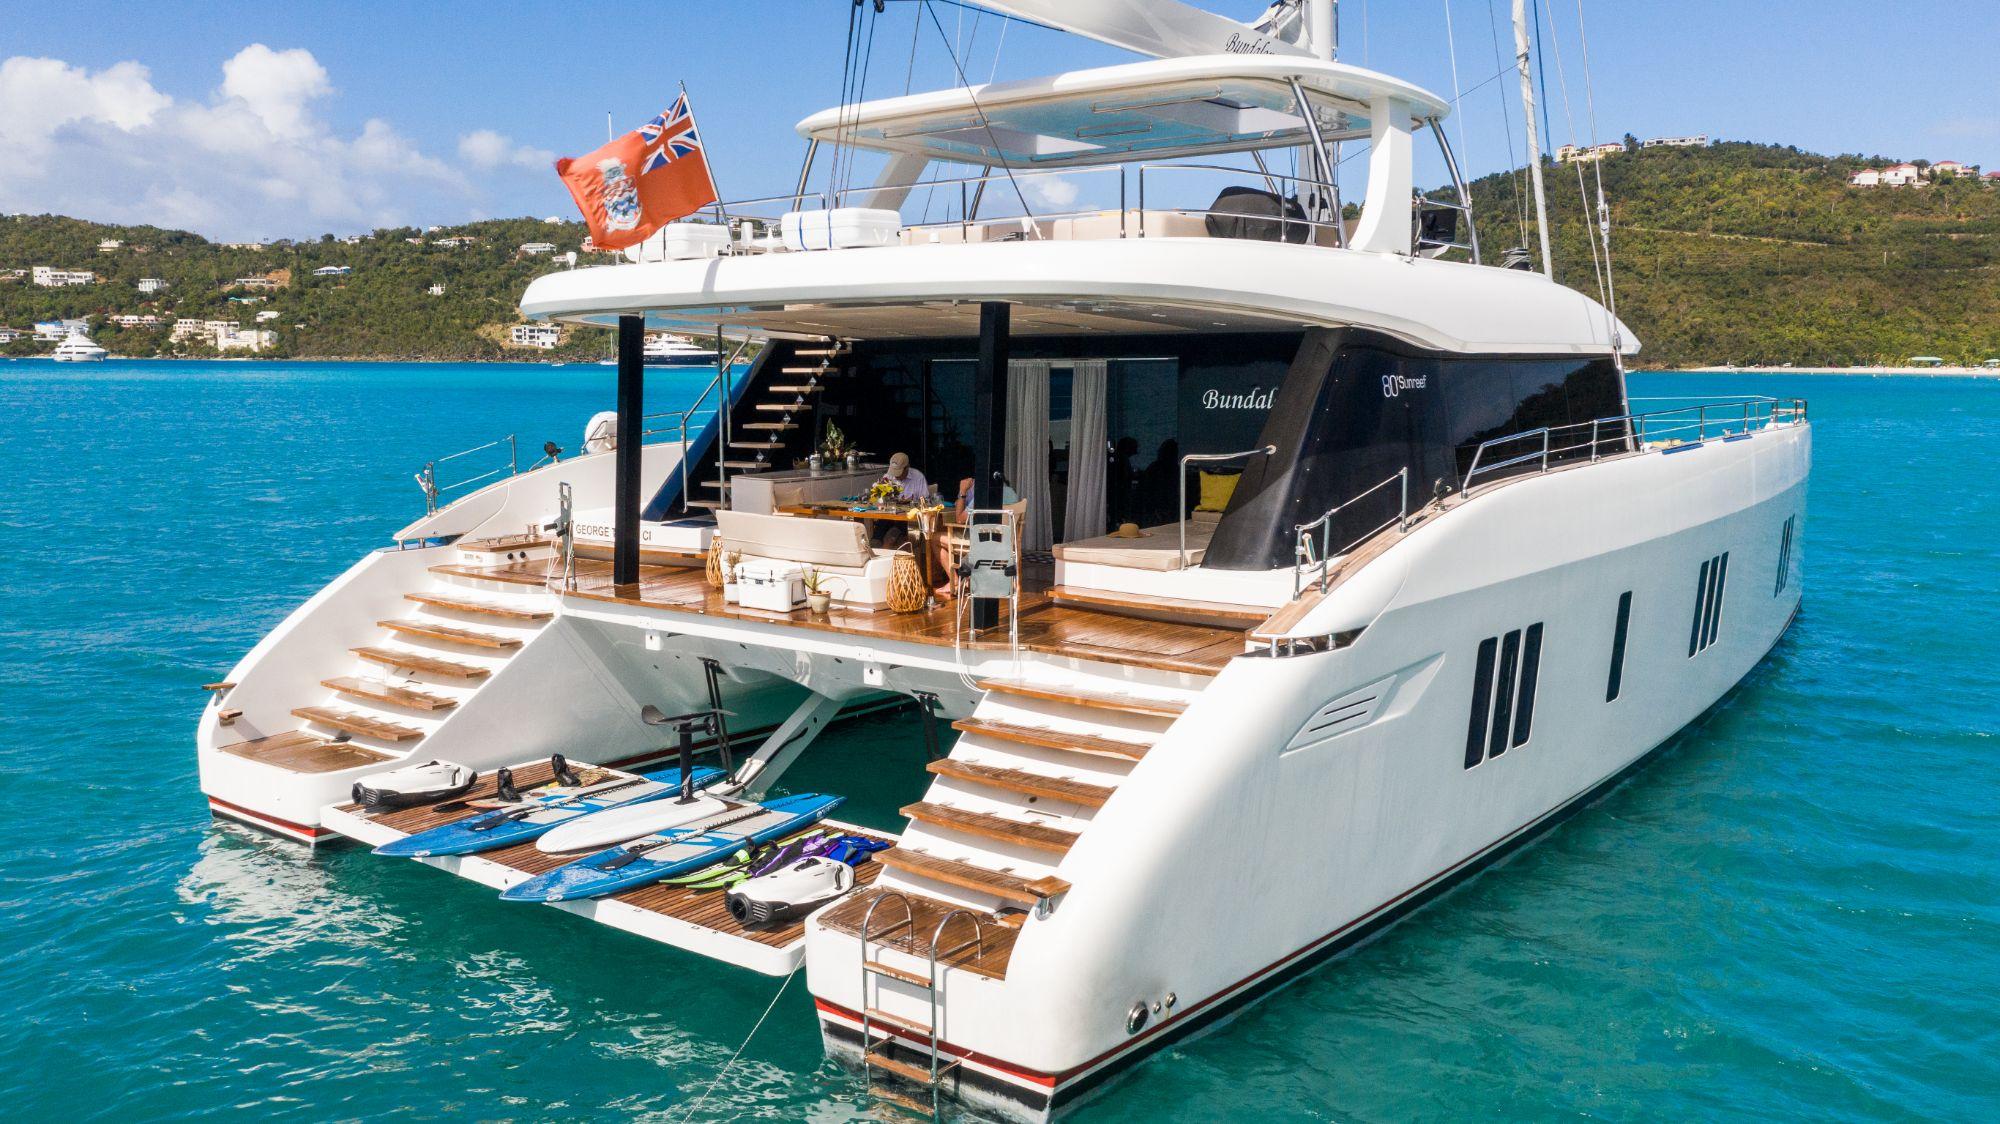 Luxury Yacht Charter: BUNDALONG | 80' Sunreef 2019  - photo 10